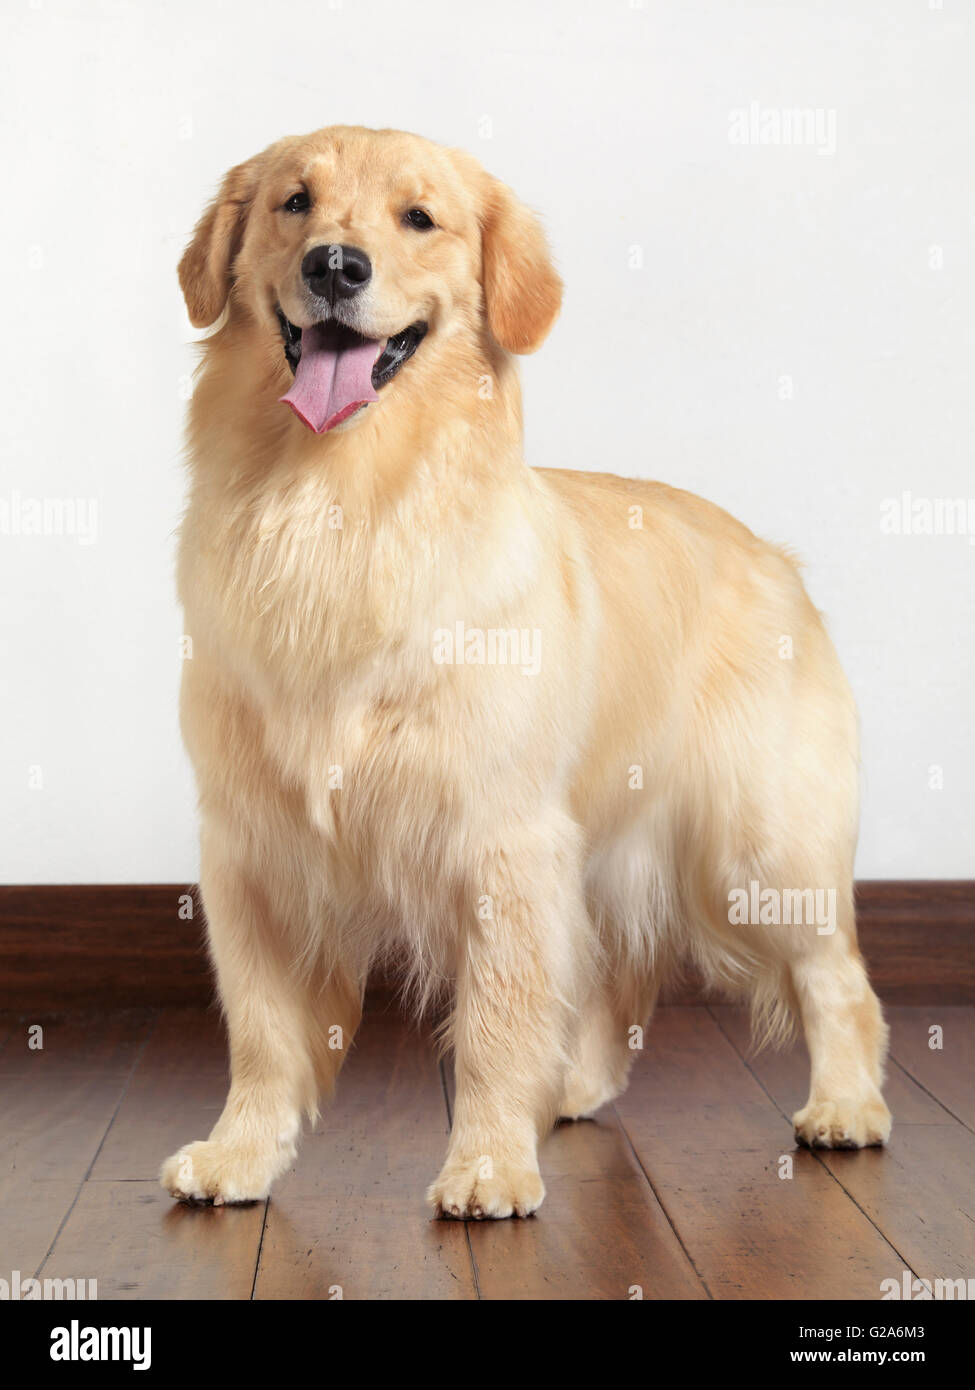 Golden Retriever, quince meses Imagen De Stock